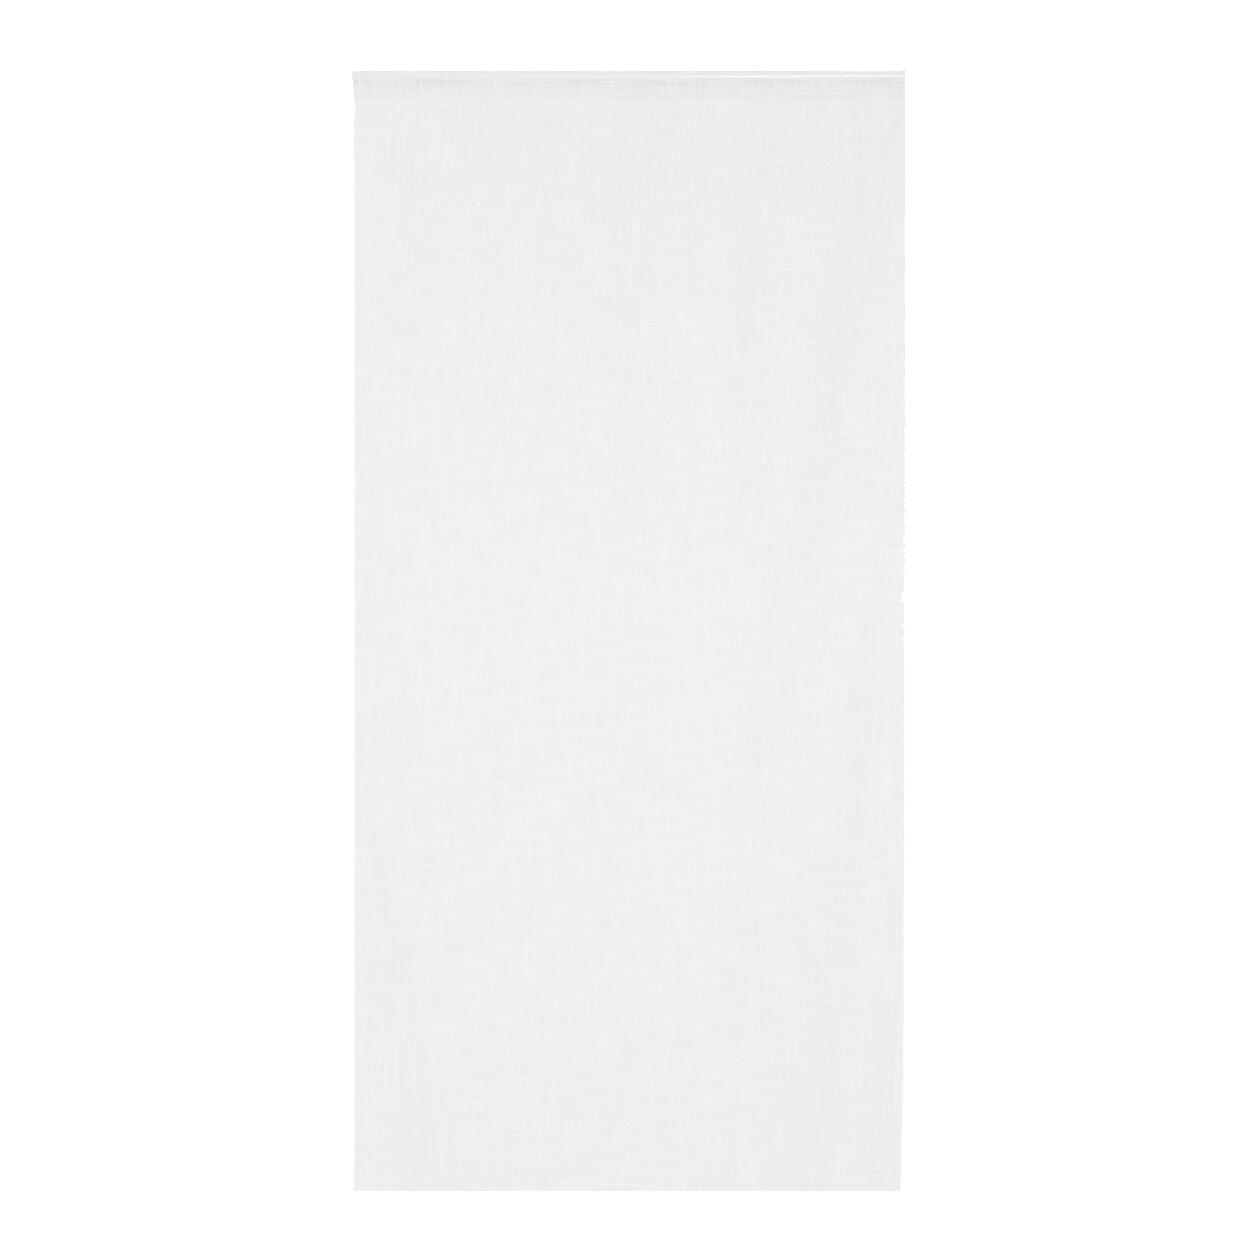 Tendina vetro Infini bianco tunnel 60 x 120 cm - 3